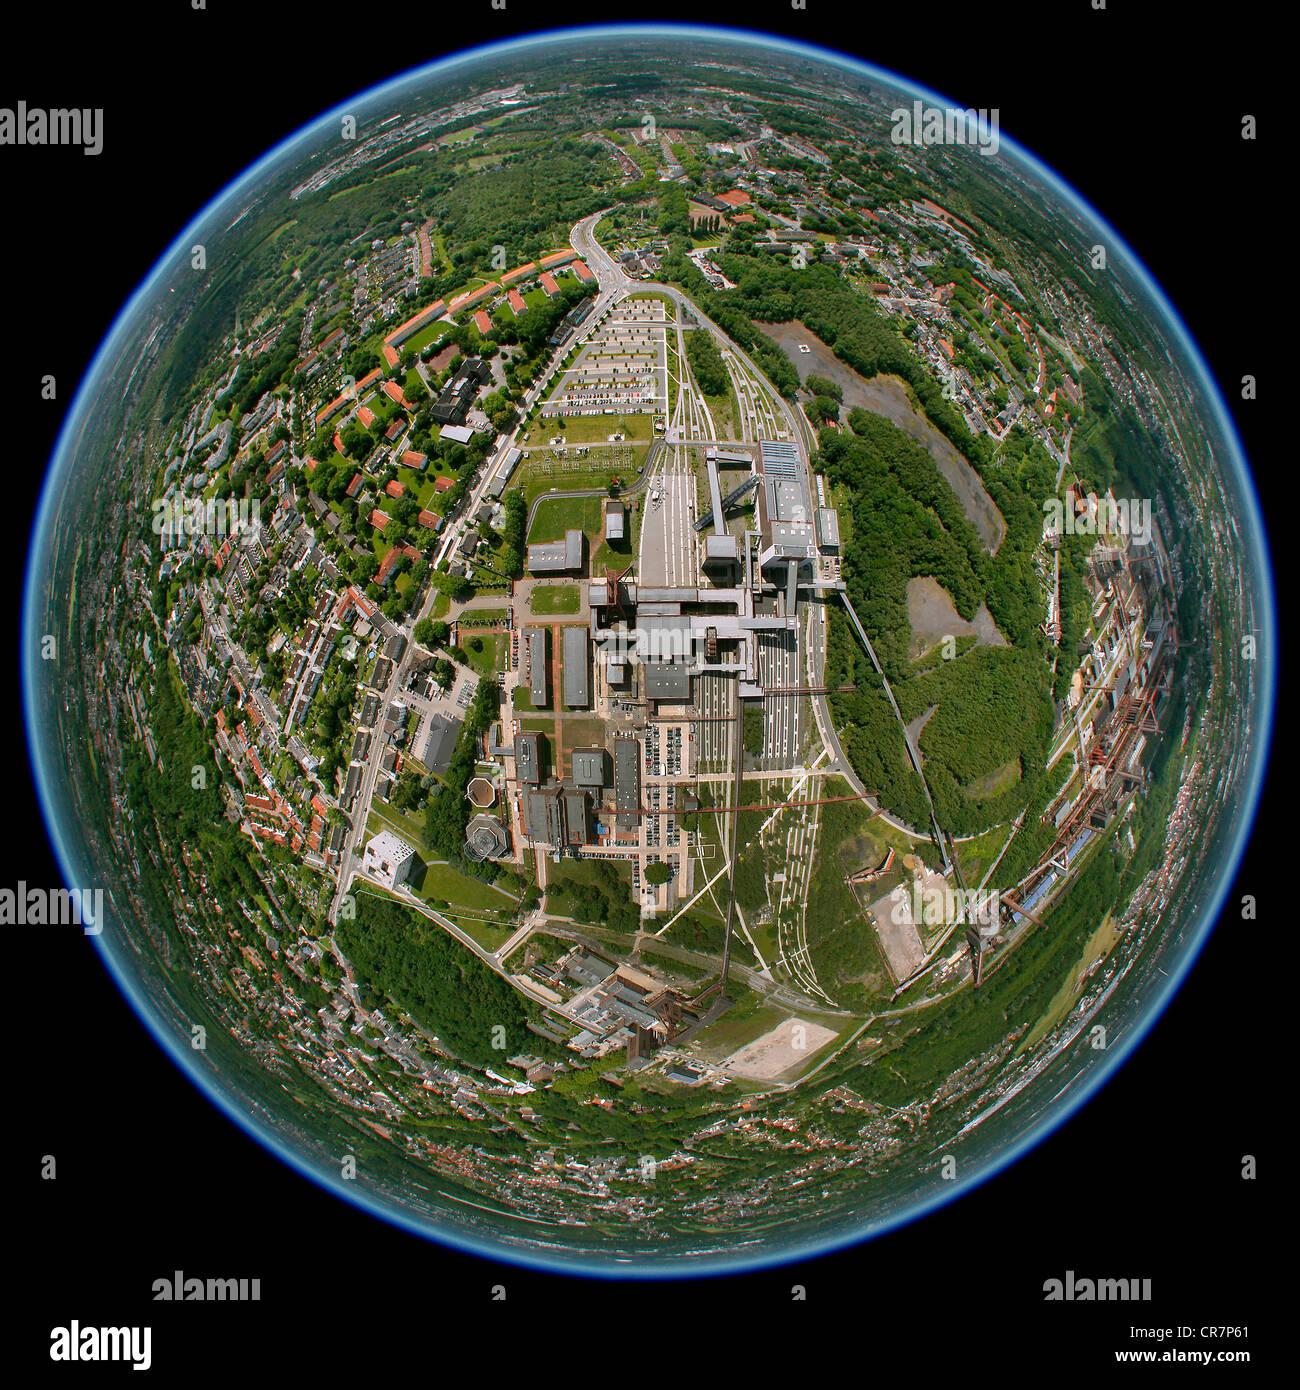 Aerial view, fisheye shot, Zeche Zollverein former mine, Kokerei Zollverein cokery, UNESCO World Heritage Site, - Stock Image